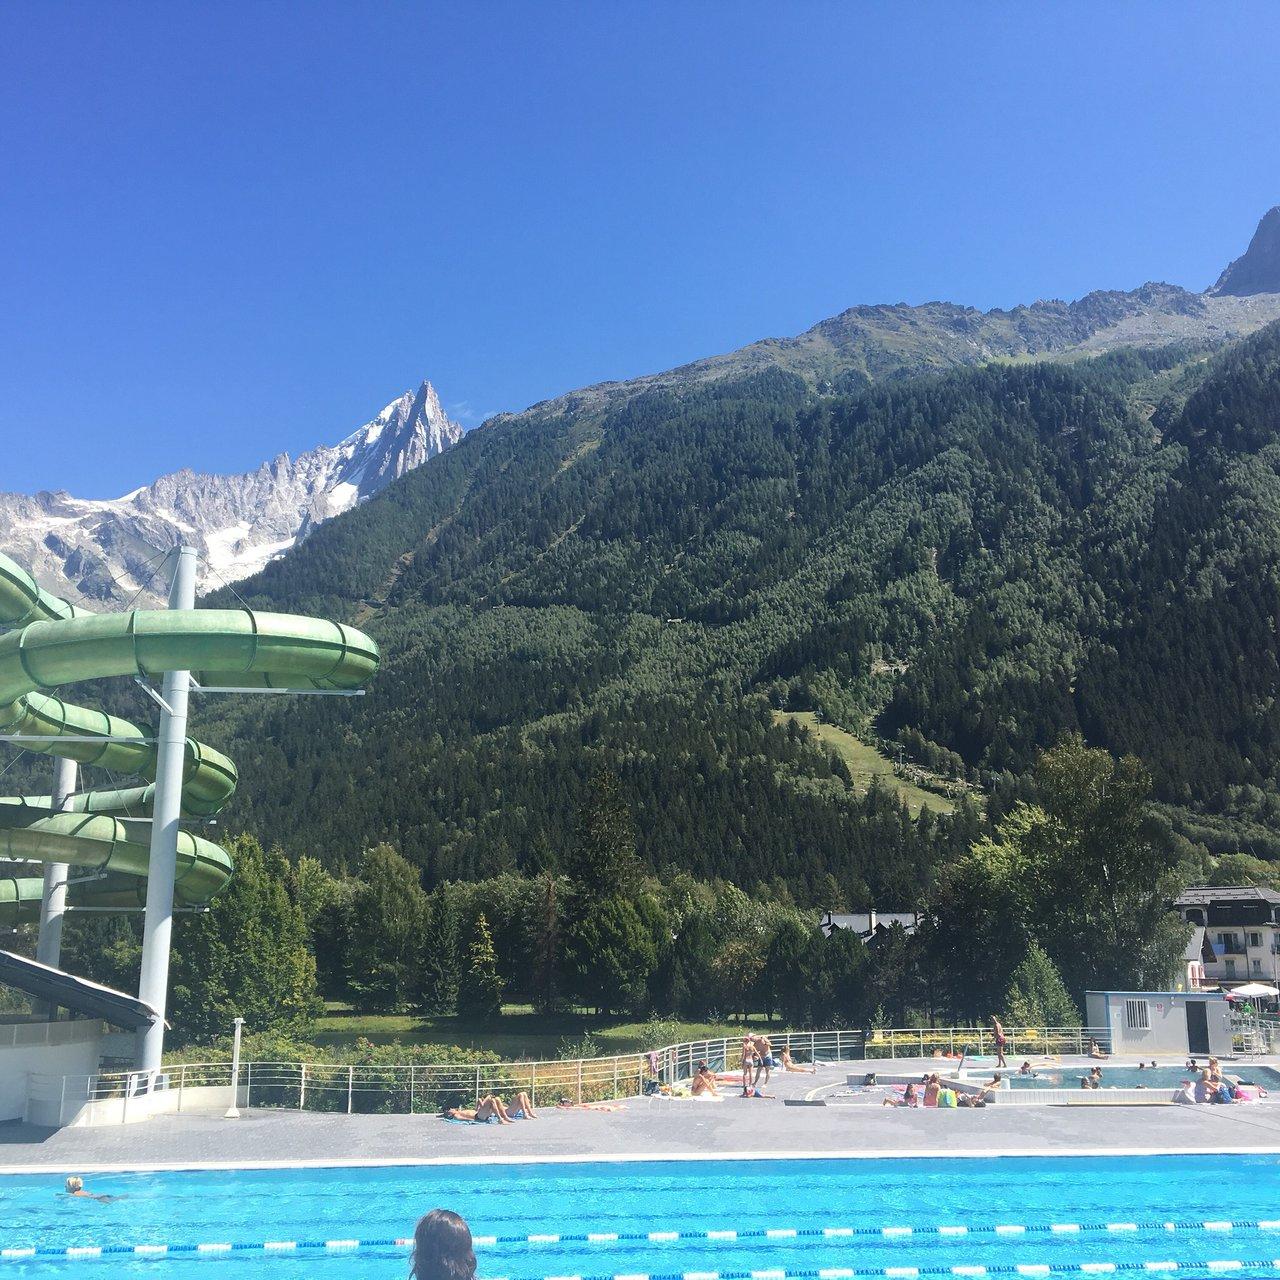 Piscine Et Centre Sportif Richard-Bozon (Chamonix ... serapportantà Piscine De Chamonix